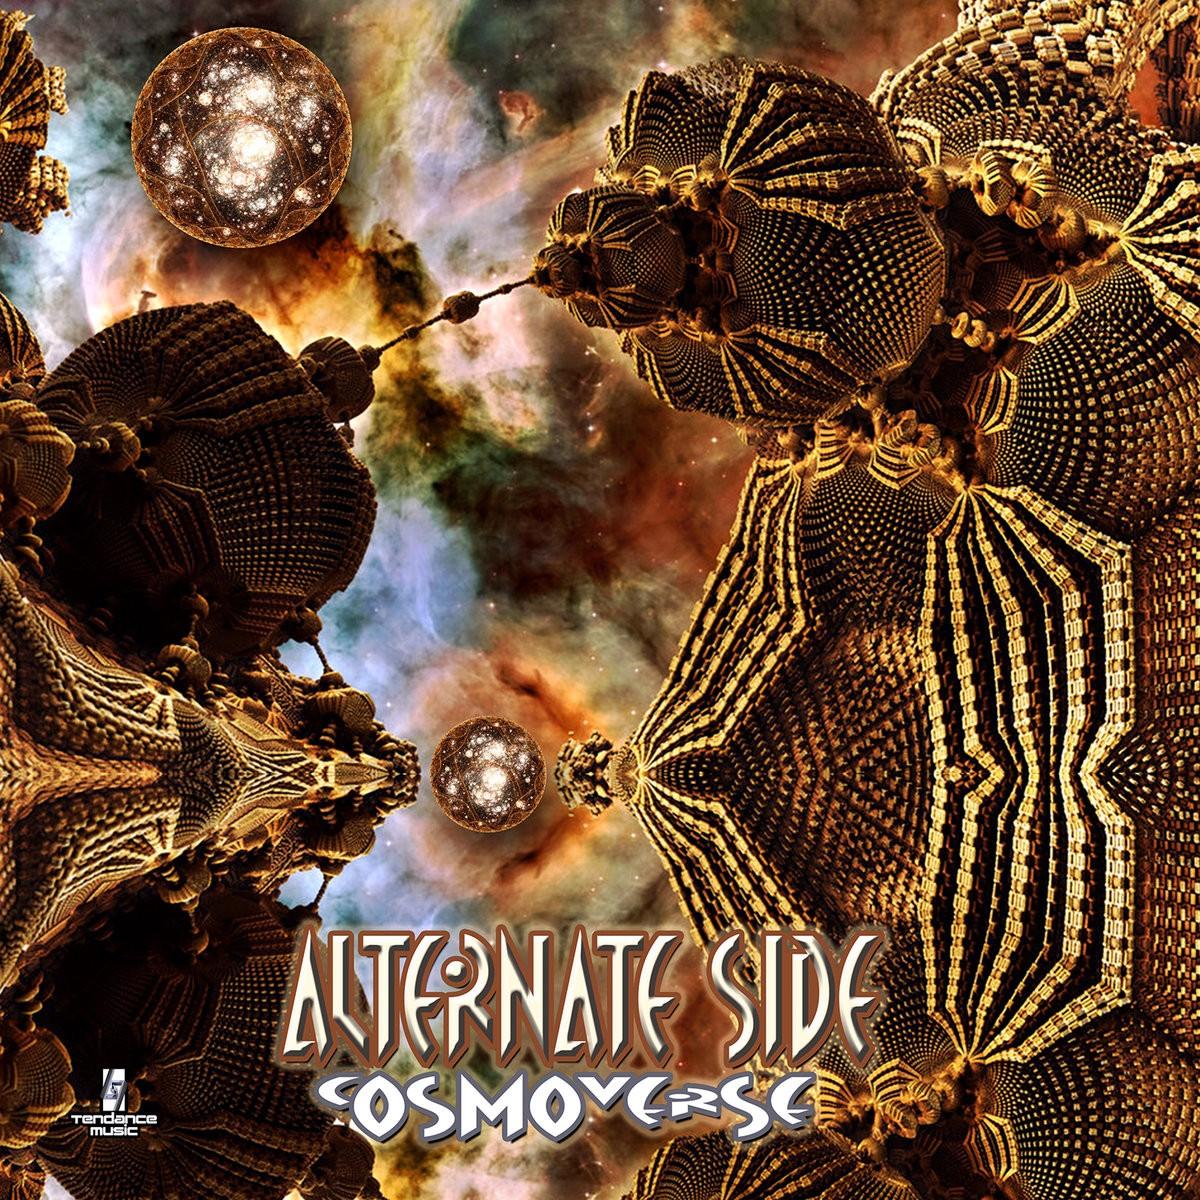 Tendance Music - ALTERNATE SIDE - Cosmoverse